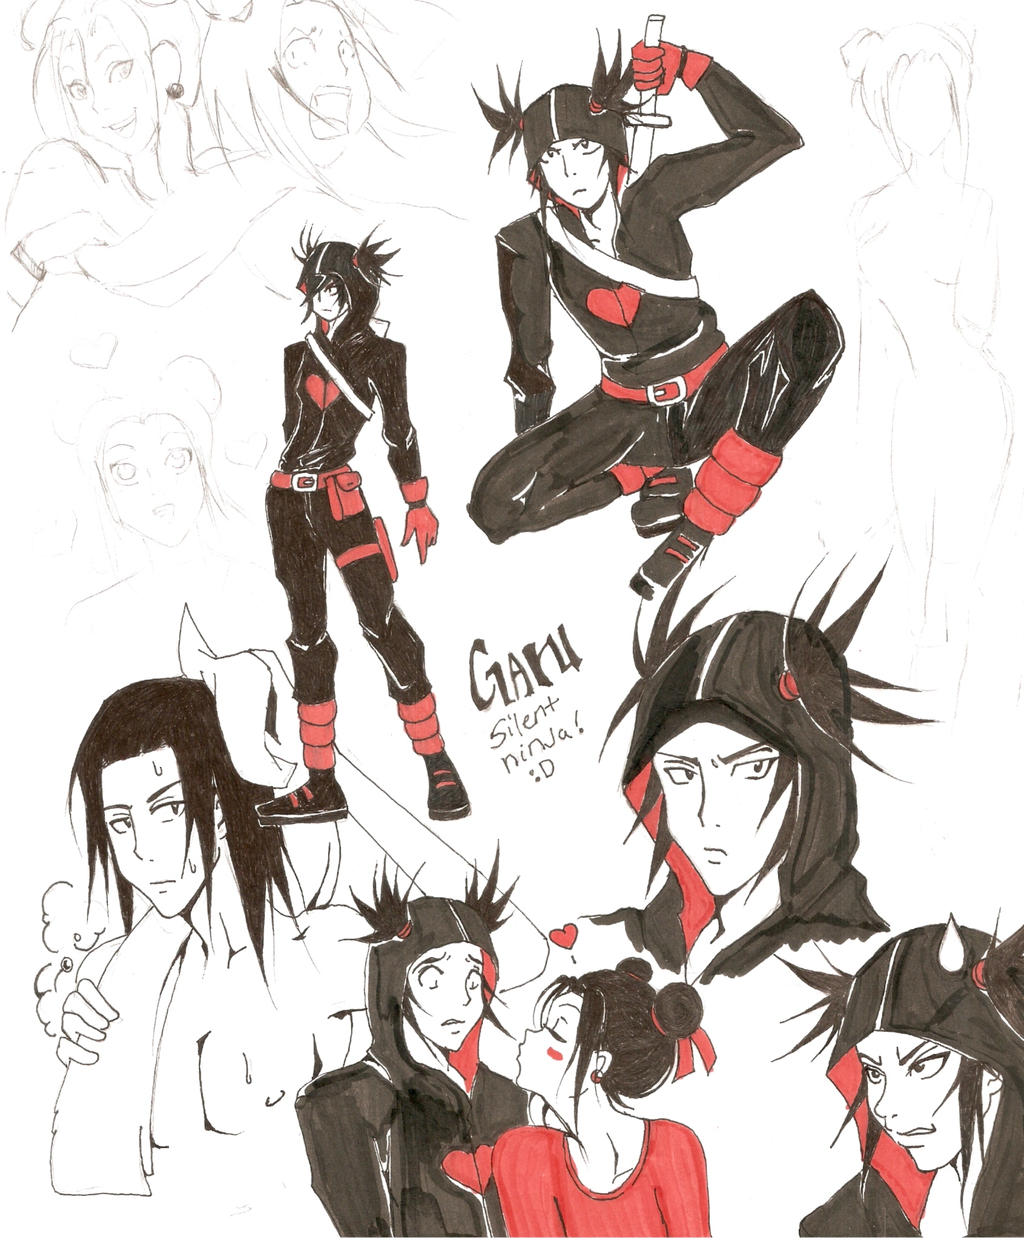 Anime Garu by prince-di-caos on DeviantArt